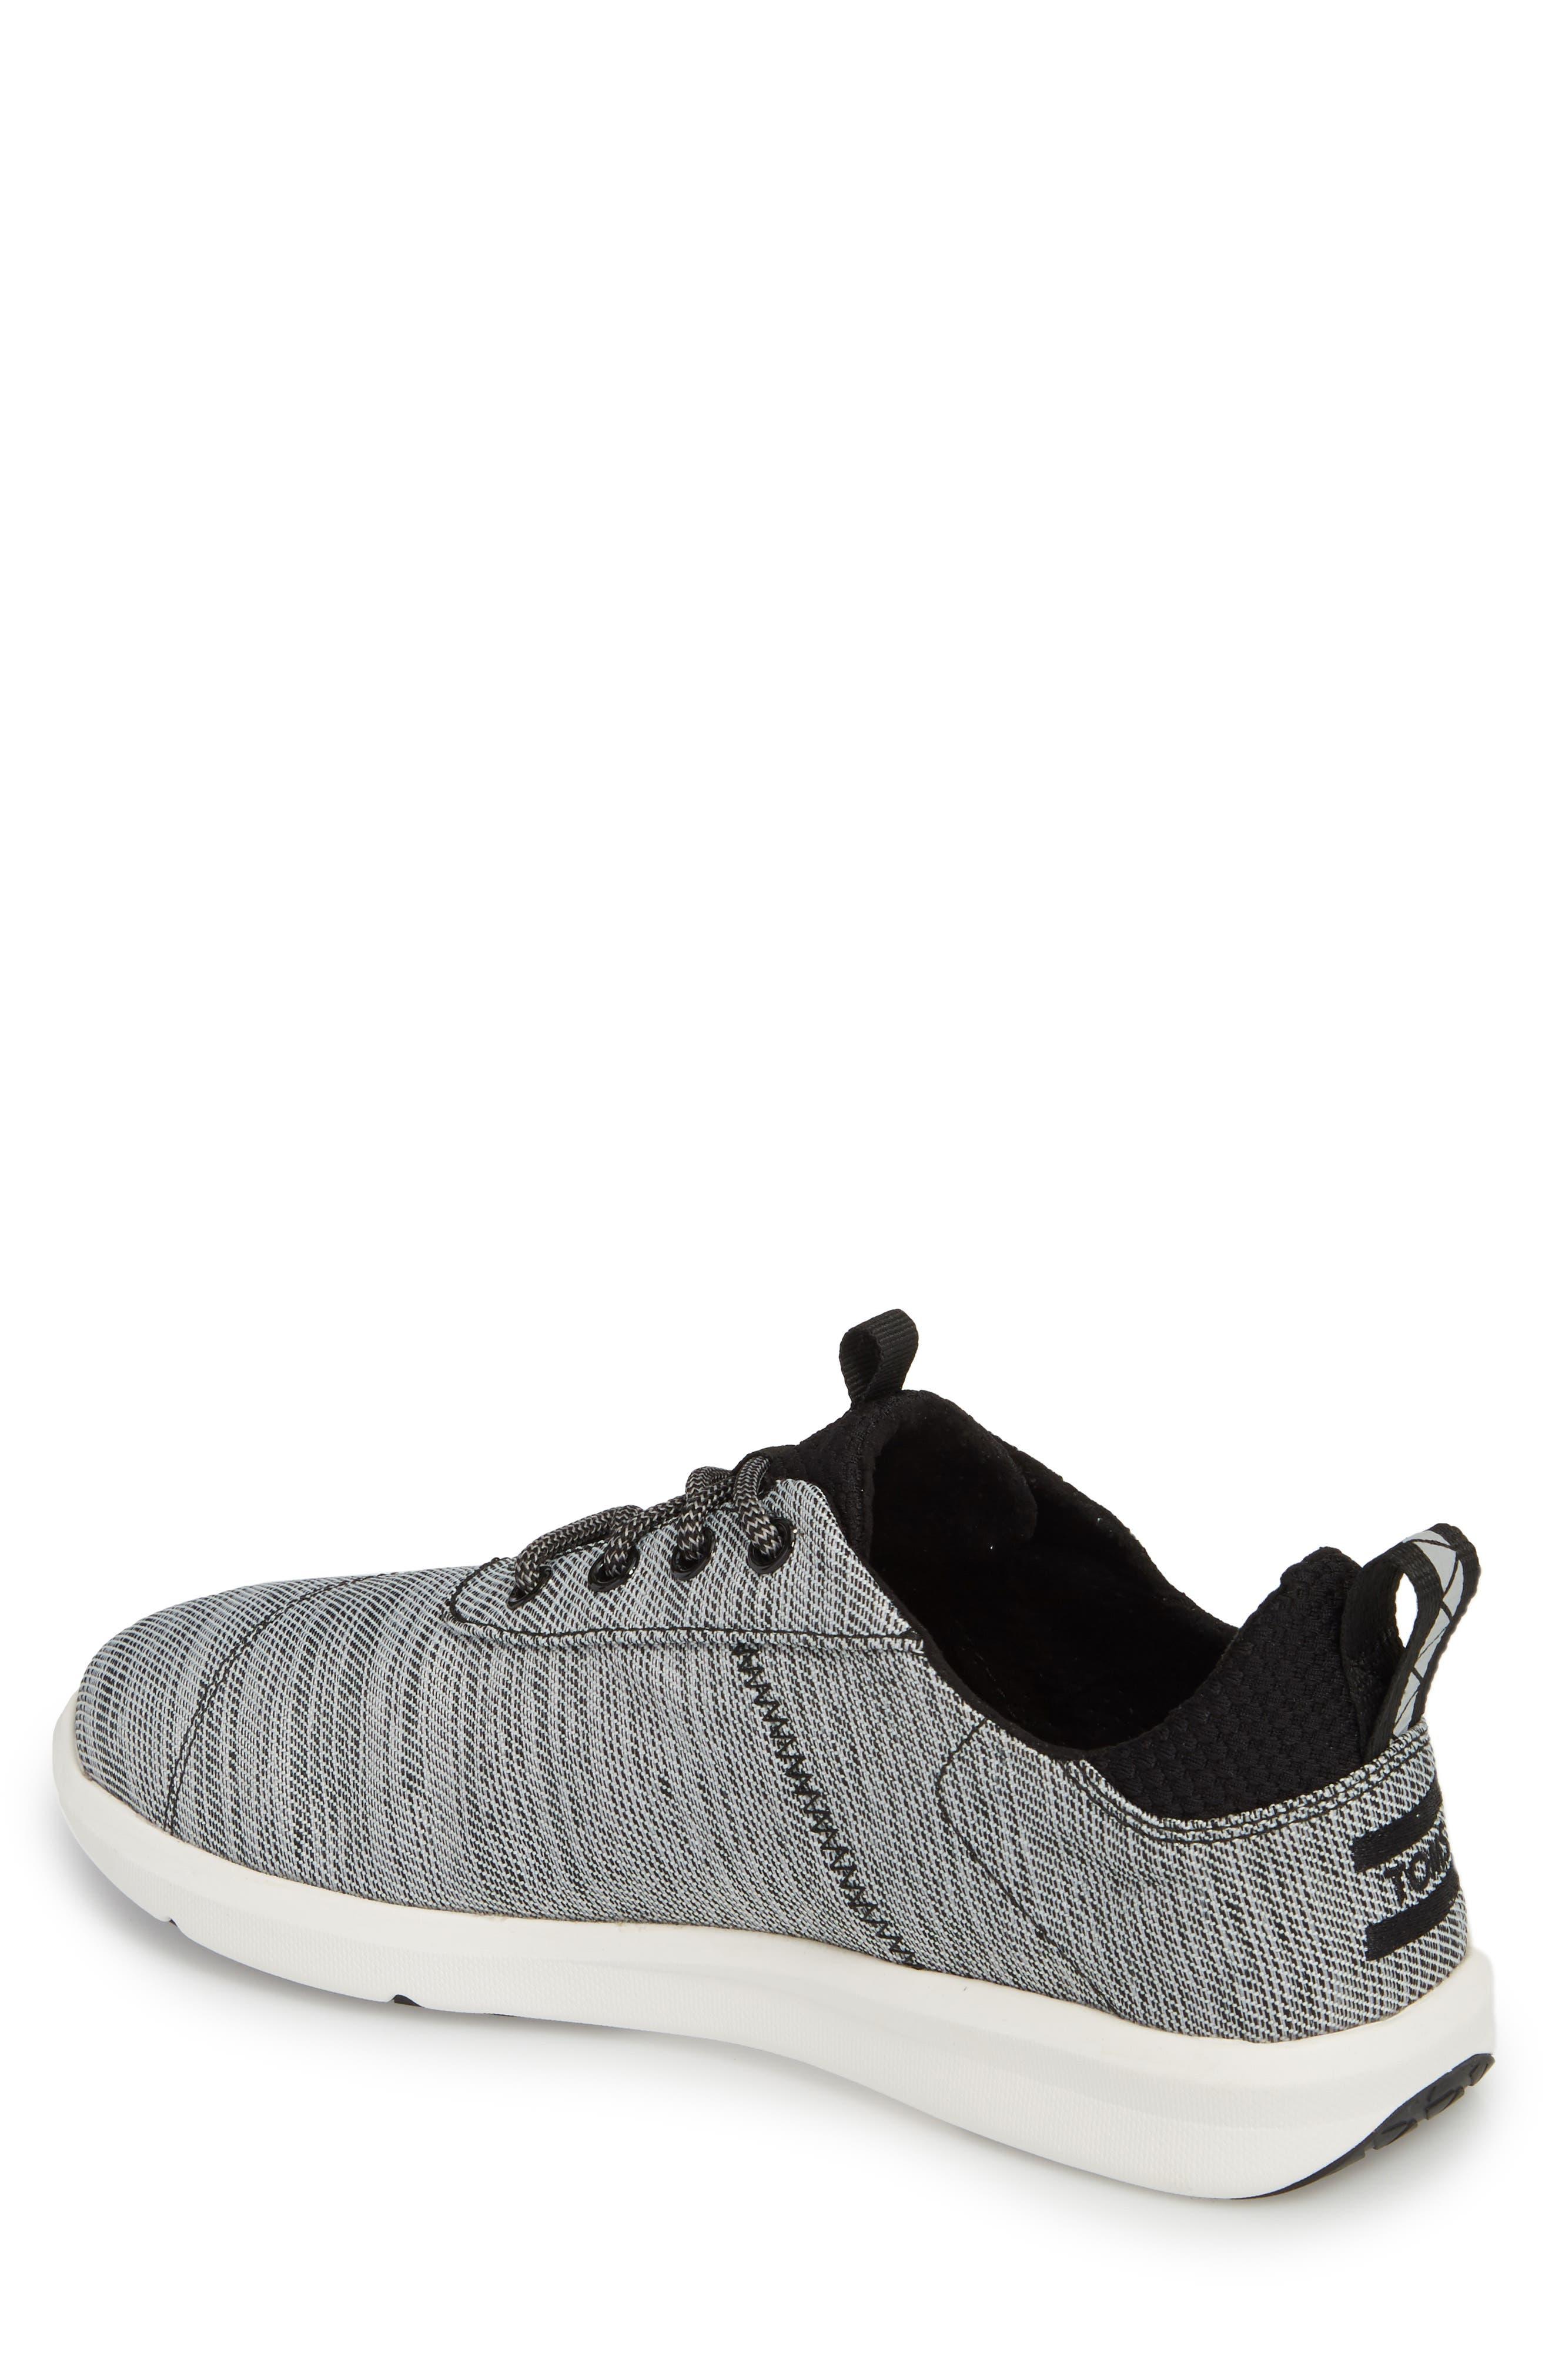 Cabrillo Sneaker,                             Alternate thumbnail 2, color,                             Black Space-Dye